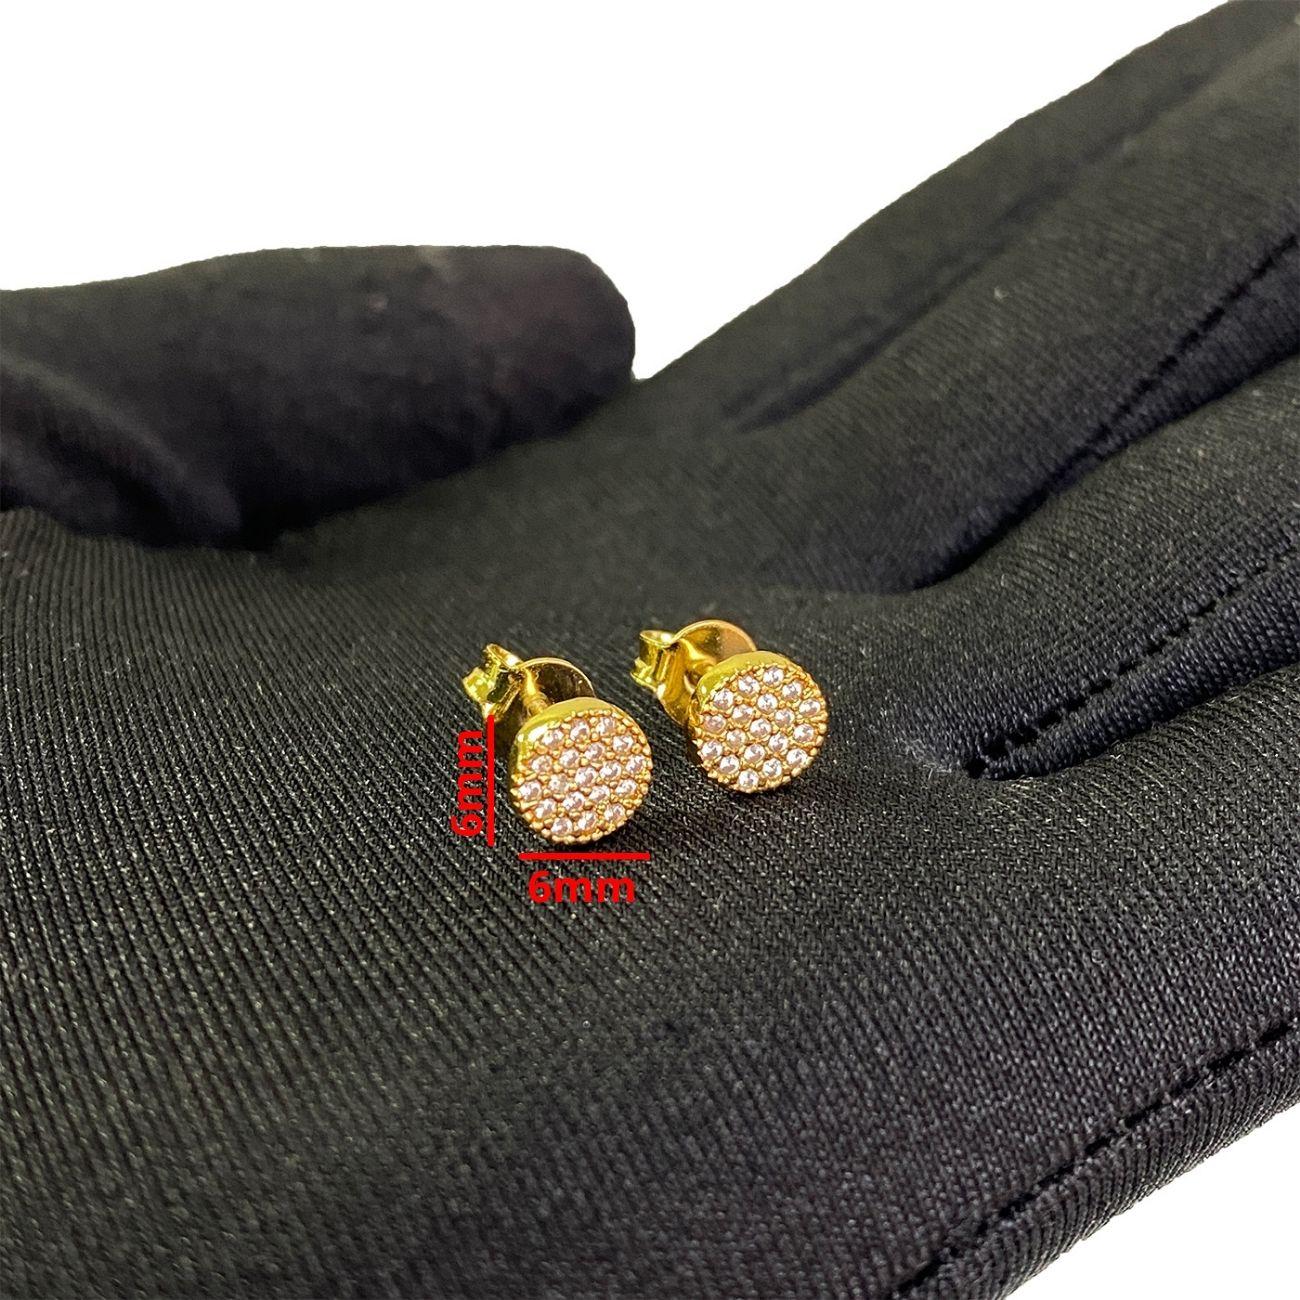 Brinco Circular 14 Pedras (Zircônia) (6mmX6mm) (Banho Ouro 24k)